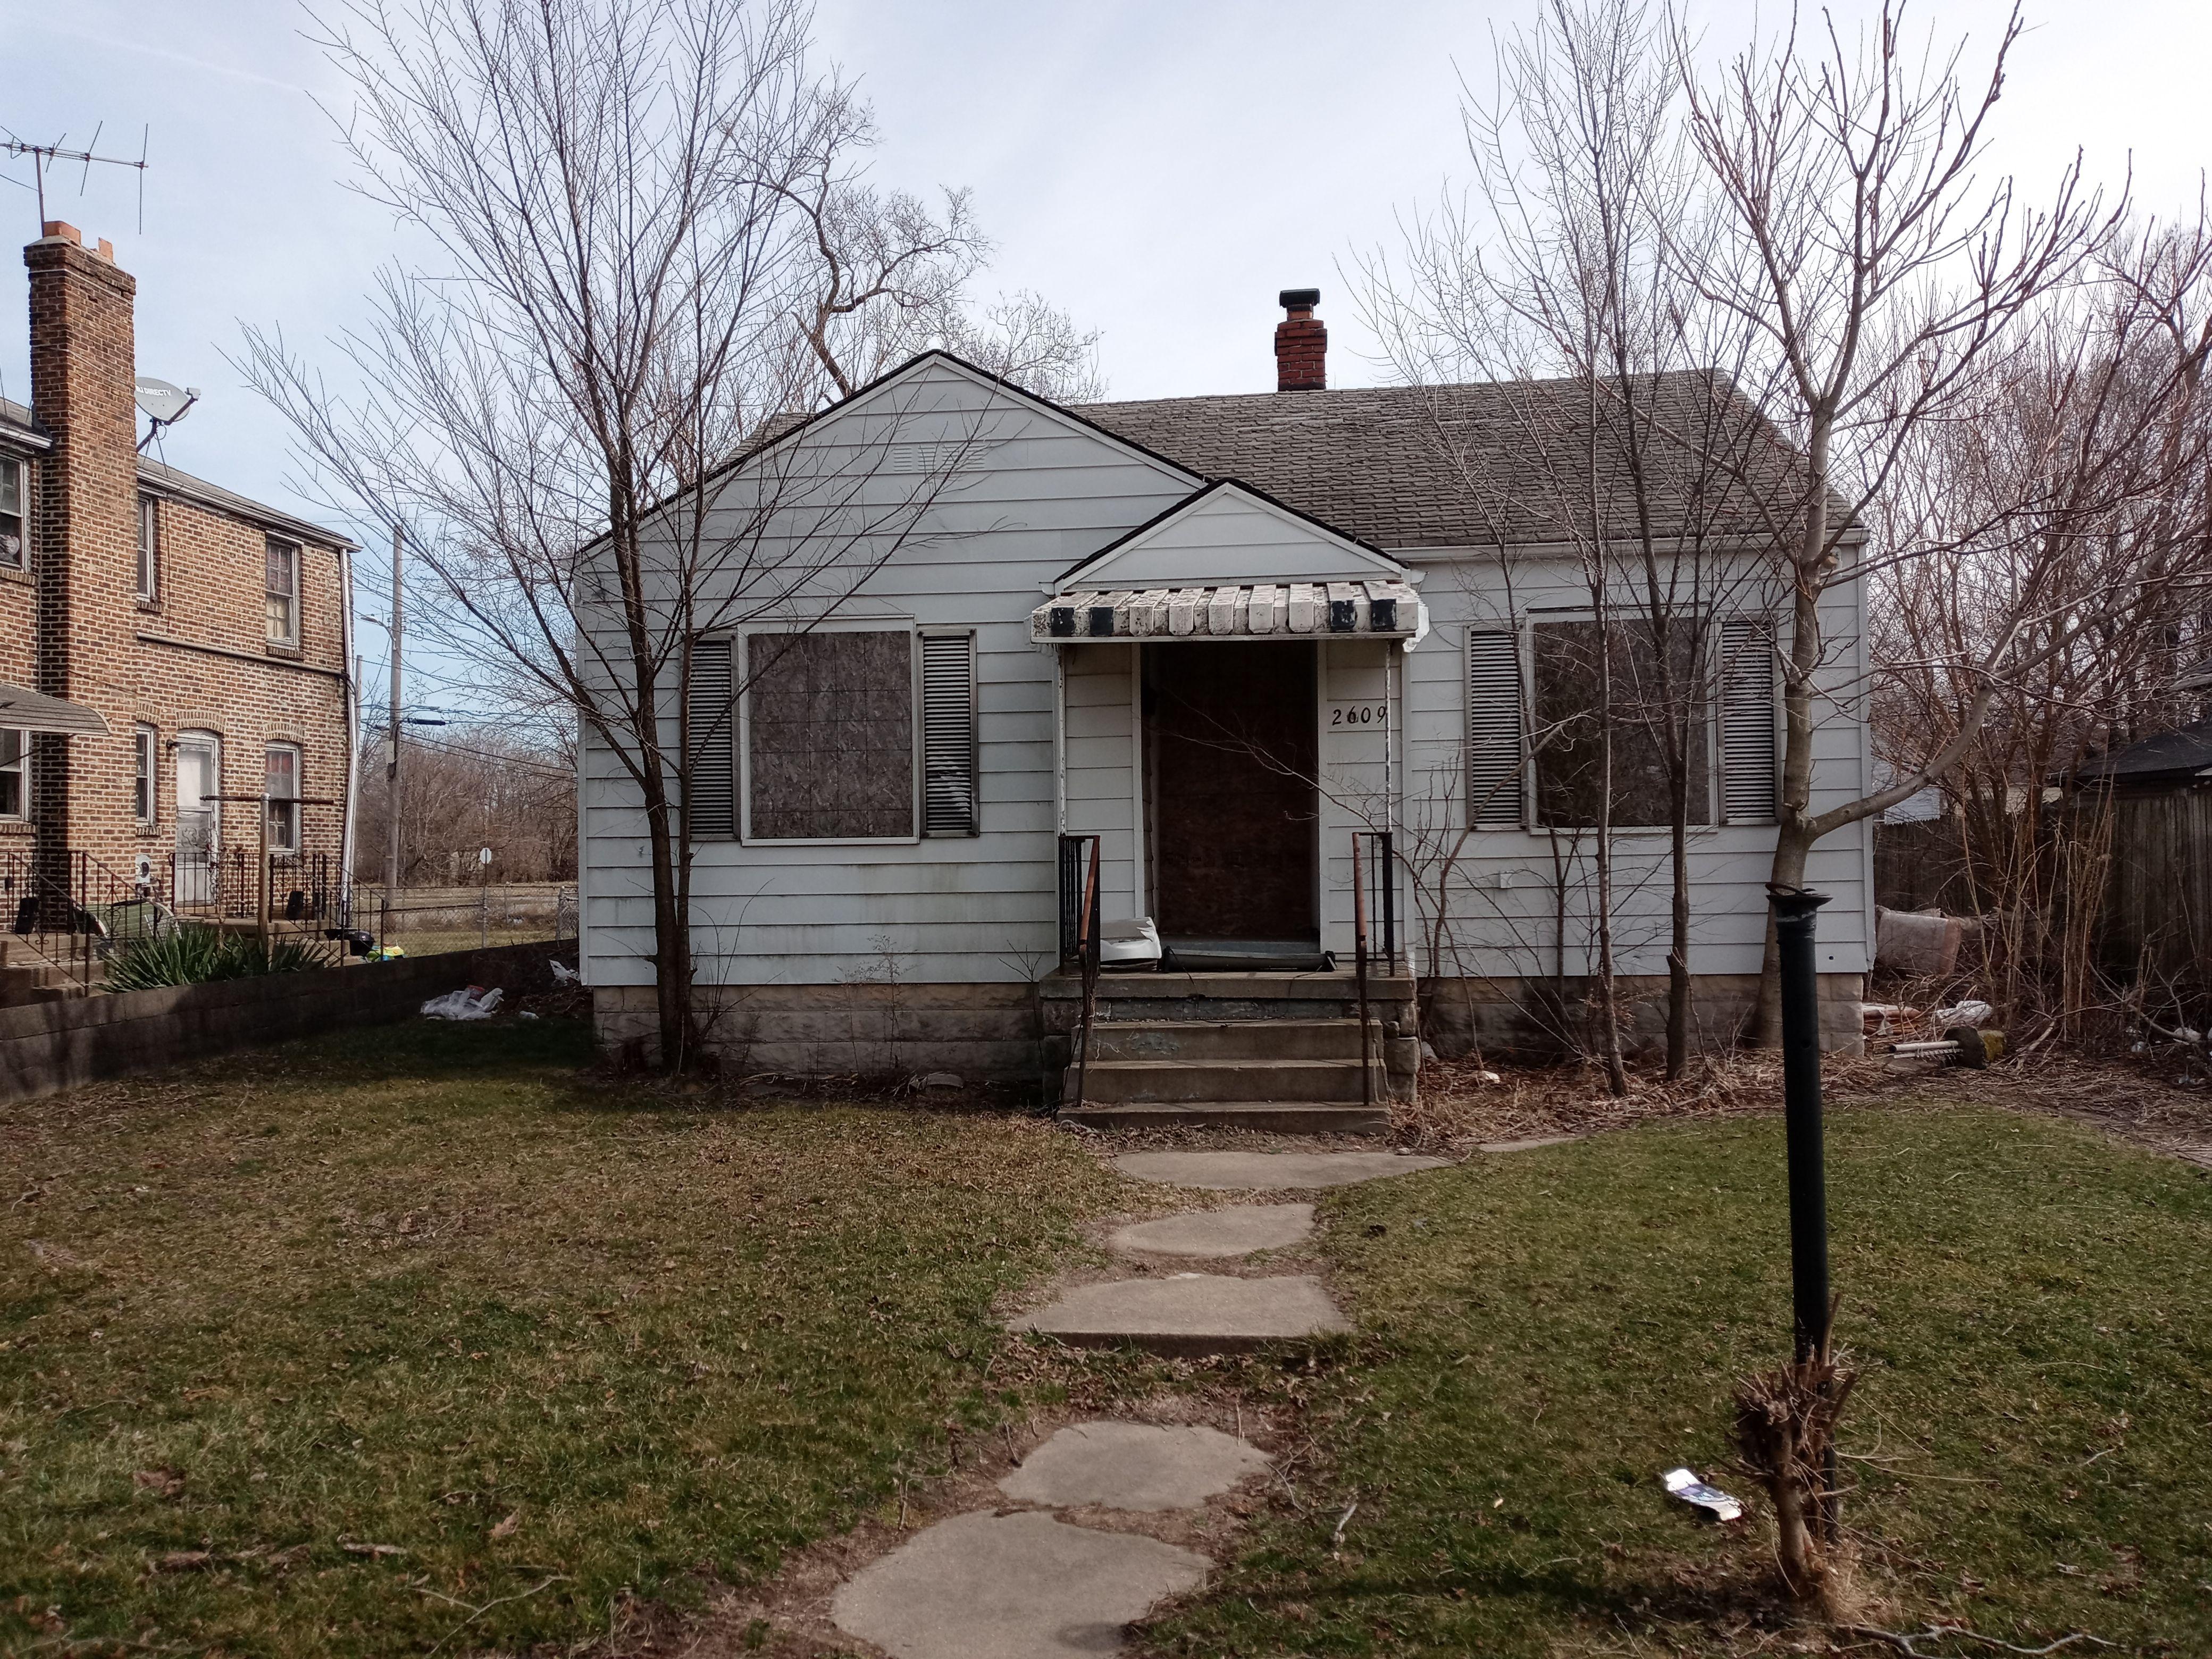 2609 Jackson St, Gary, IN